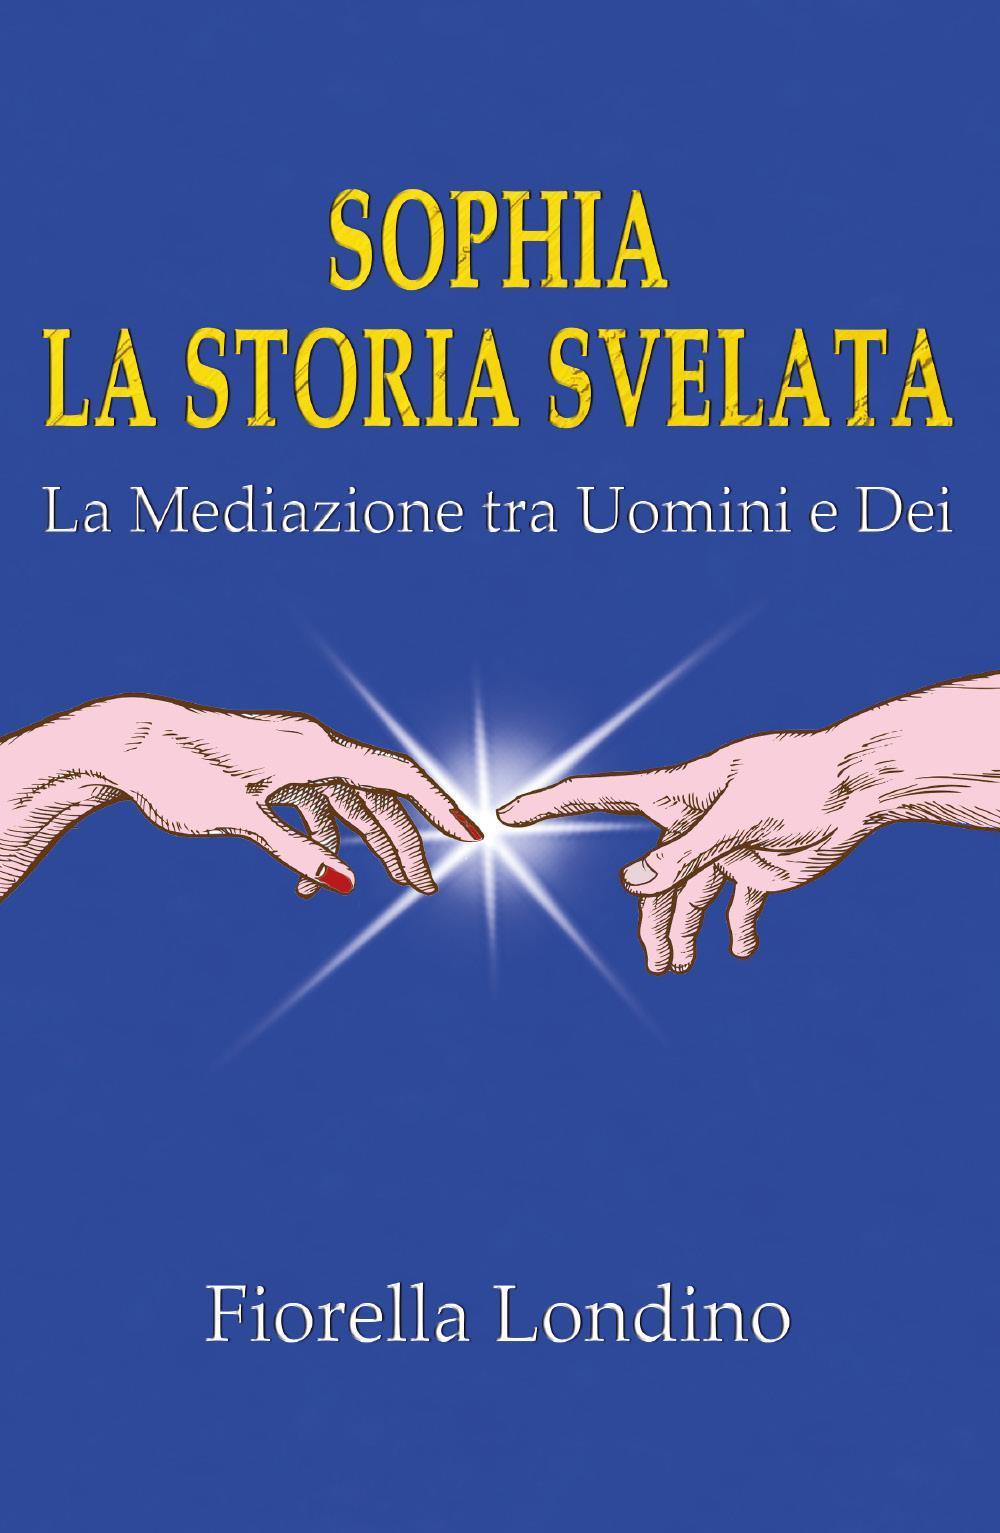 Sophia La Storia Svelata